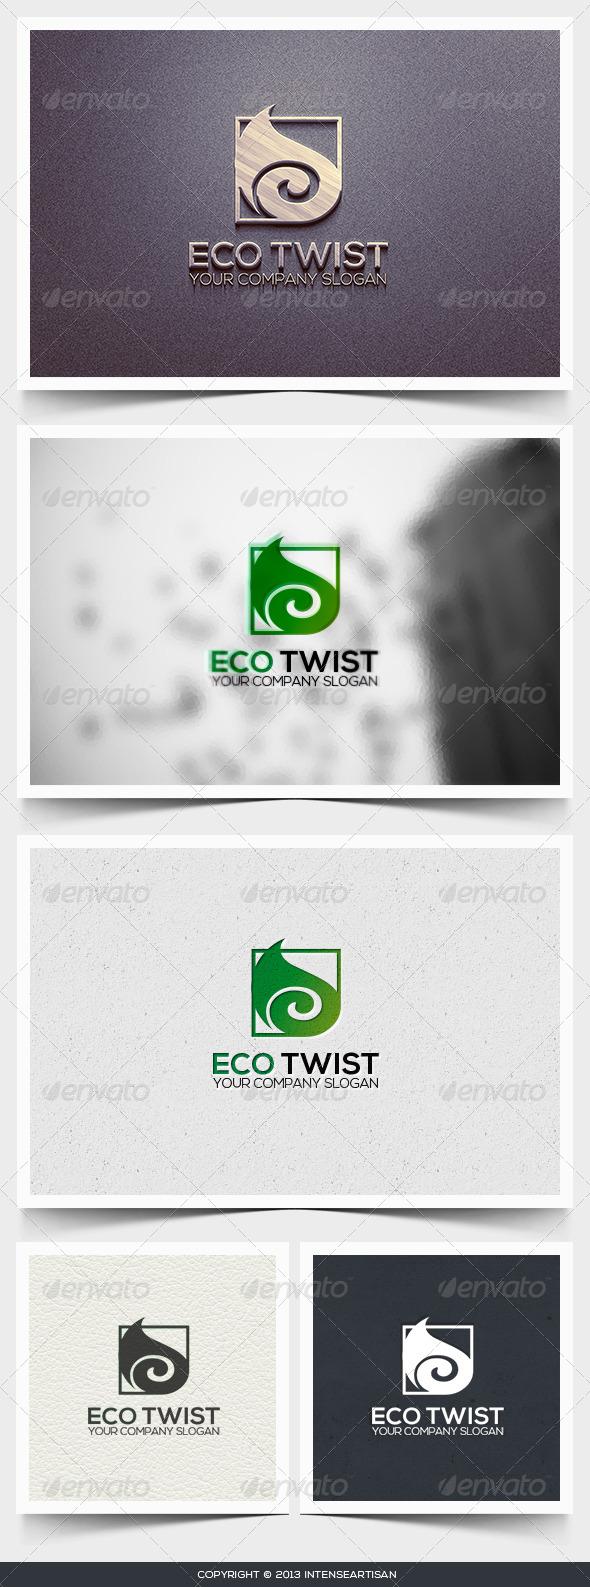 GraphicRiver Eco Twist Logo Template 6445697